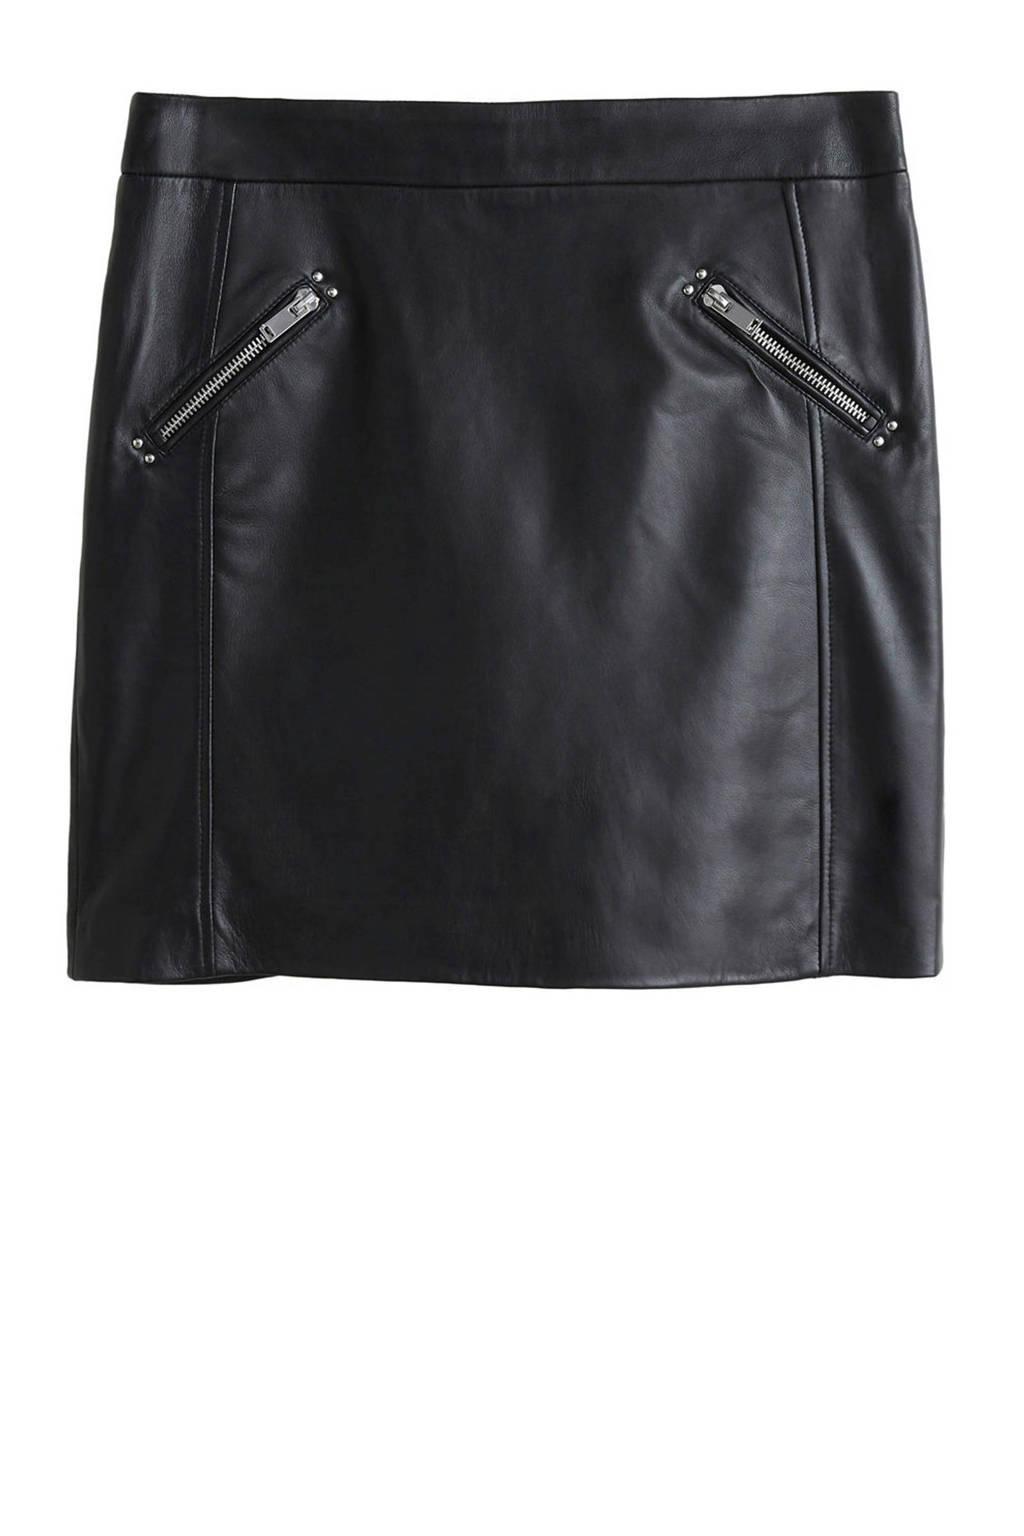 Violeta by Mango leren rok zwart, Zwart